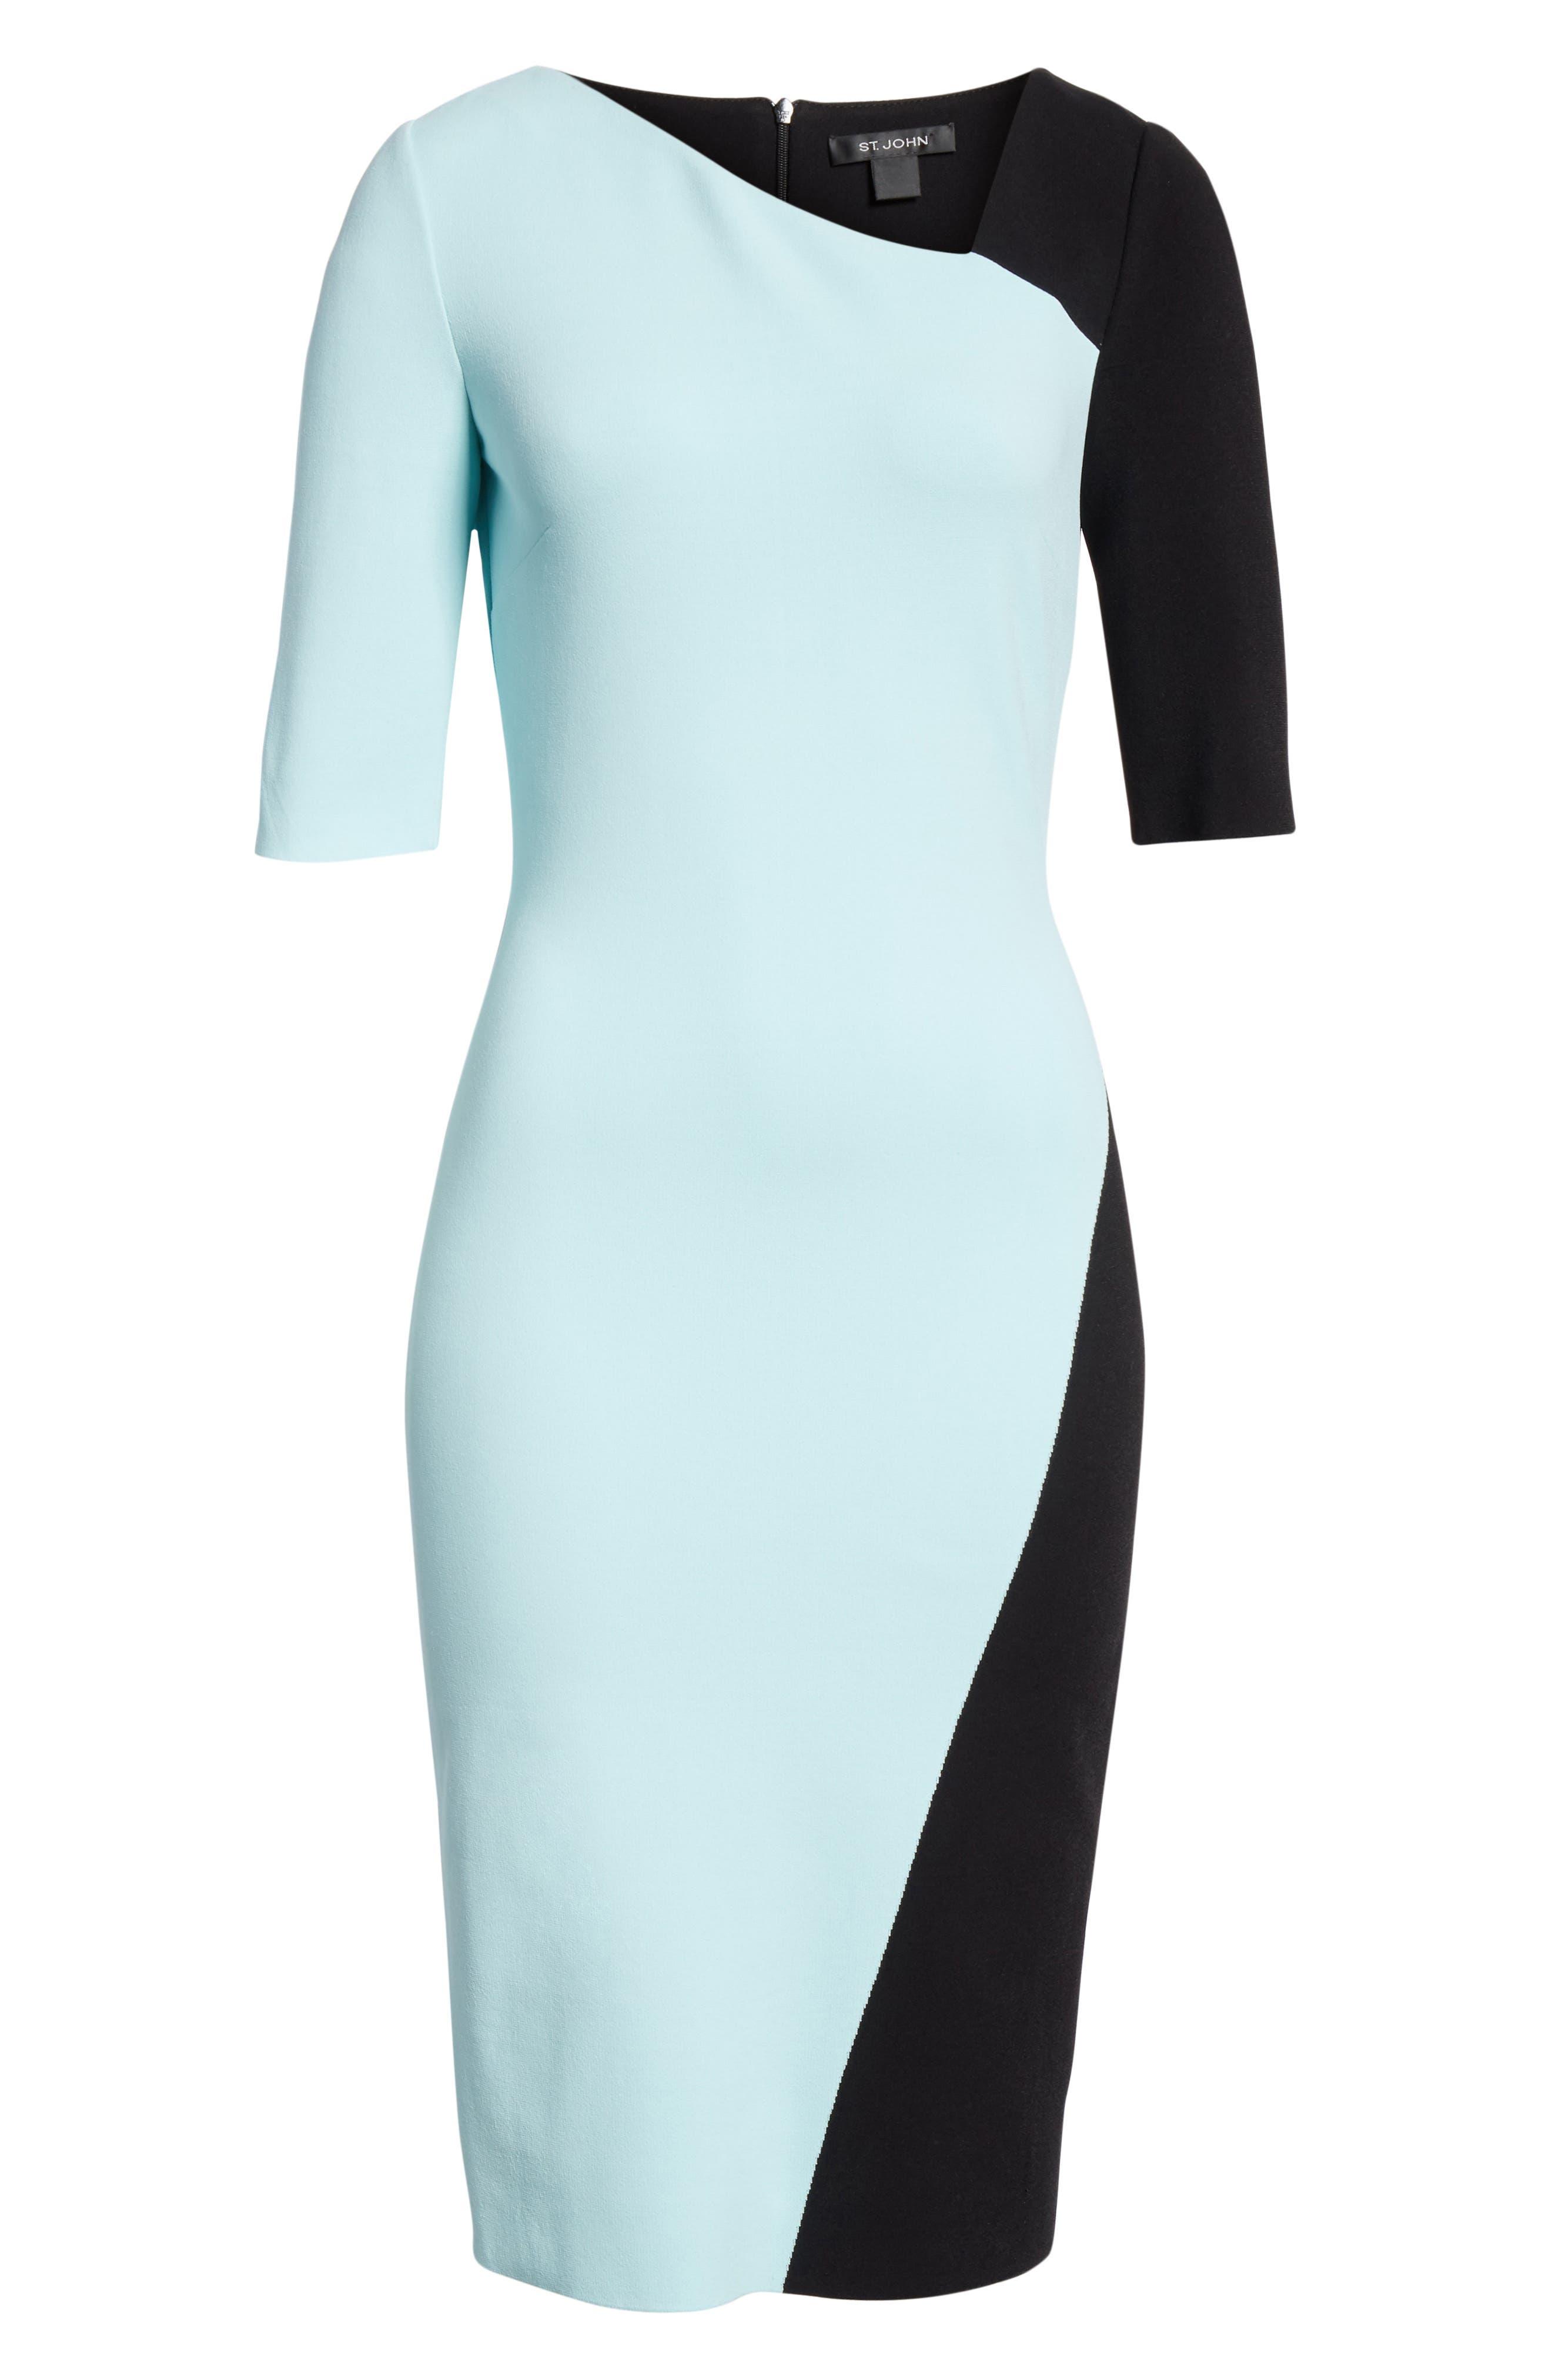 ST. JOHN COLLECTION, Luxe Sculpture Knit Dress, Alternate thumbnail 7, color, SEAFOAM/ CAVIAR